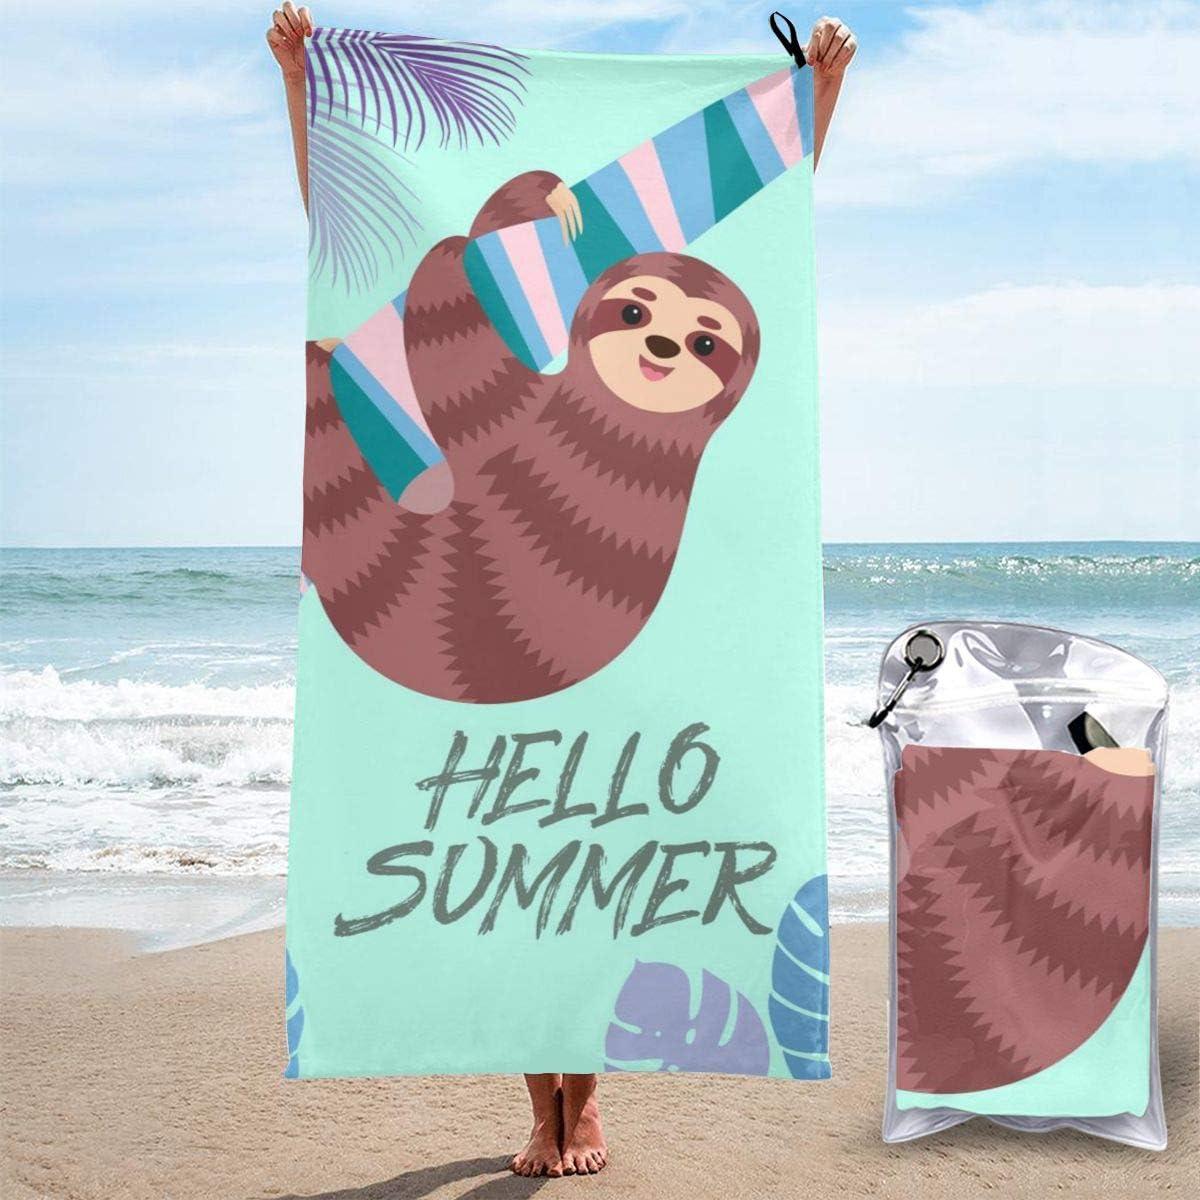 Details about  /3D Alpaca Cactus ZHU1064 Summer Plush Fleece Blanket Picnic Beach Towel Dry Zoe